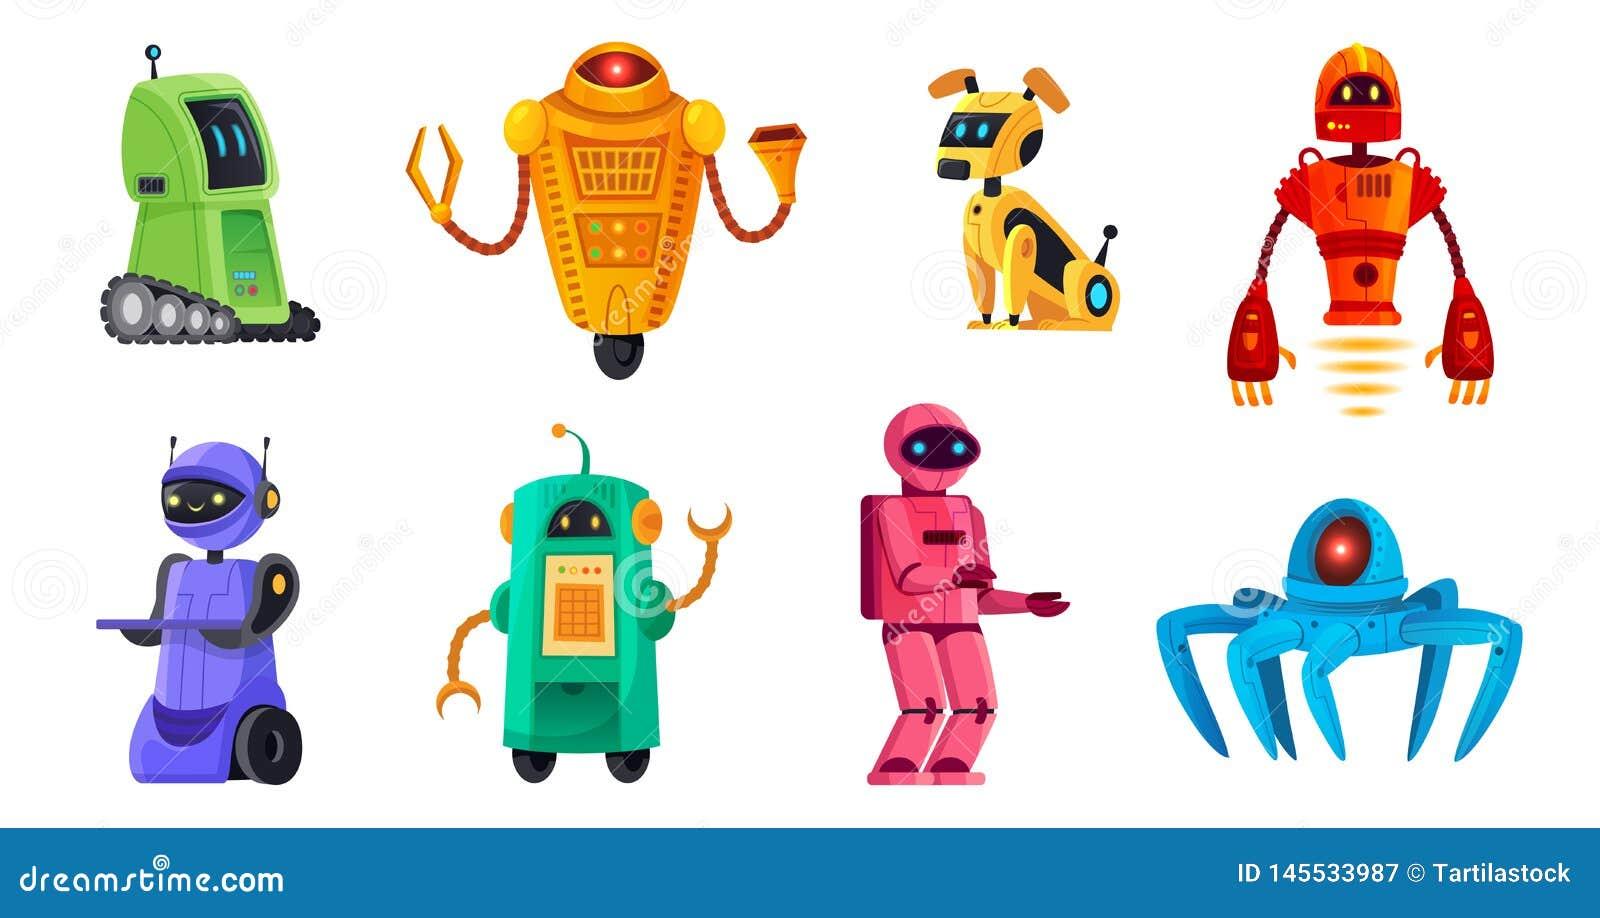 Cartoon robots. Robotics bots, robot pet and robotic android bot characters technology vector illustration set